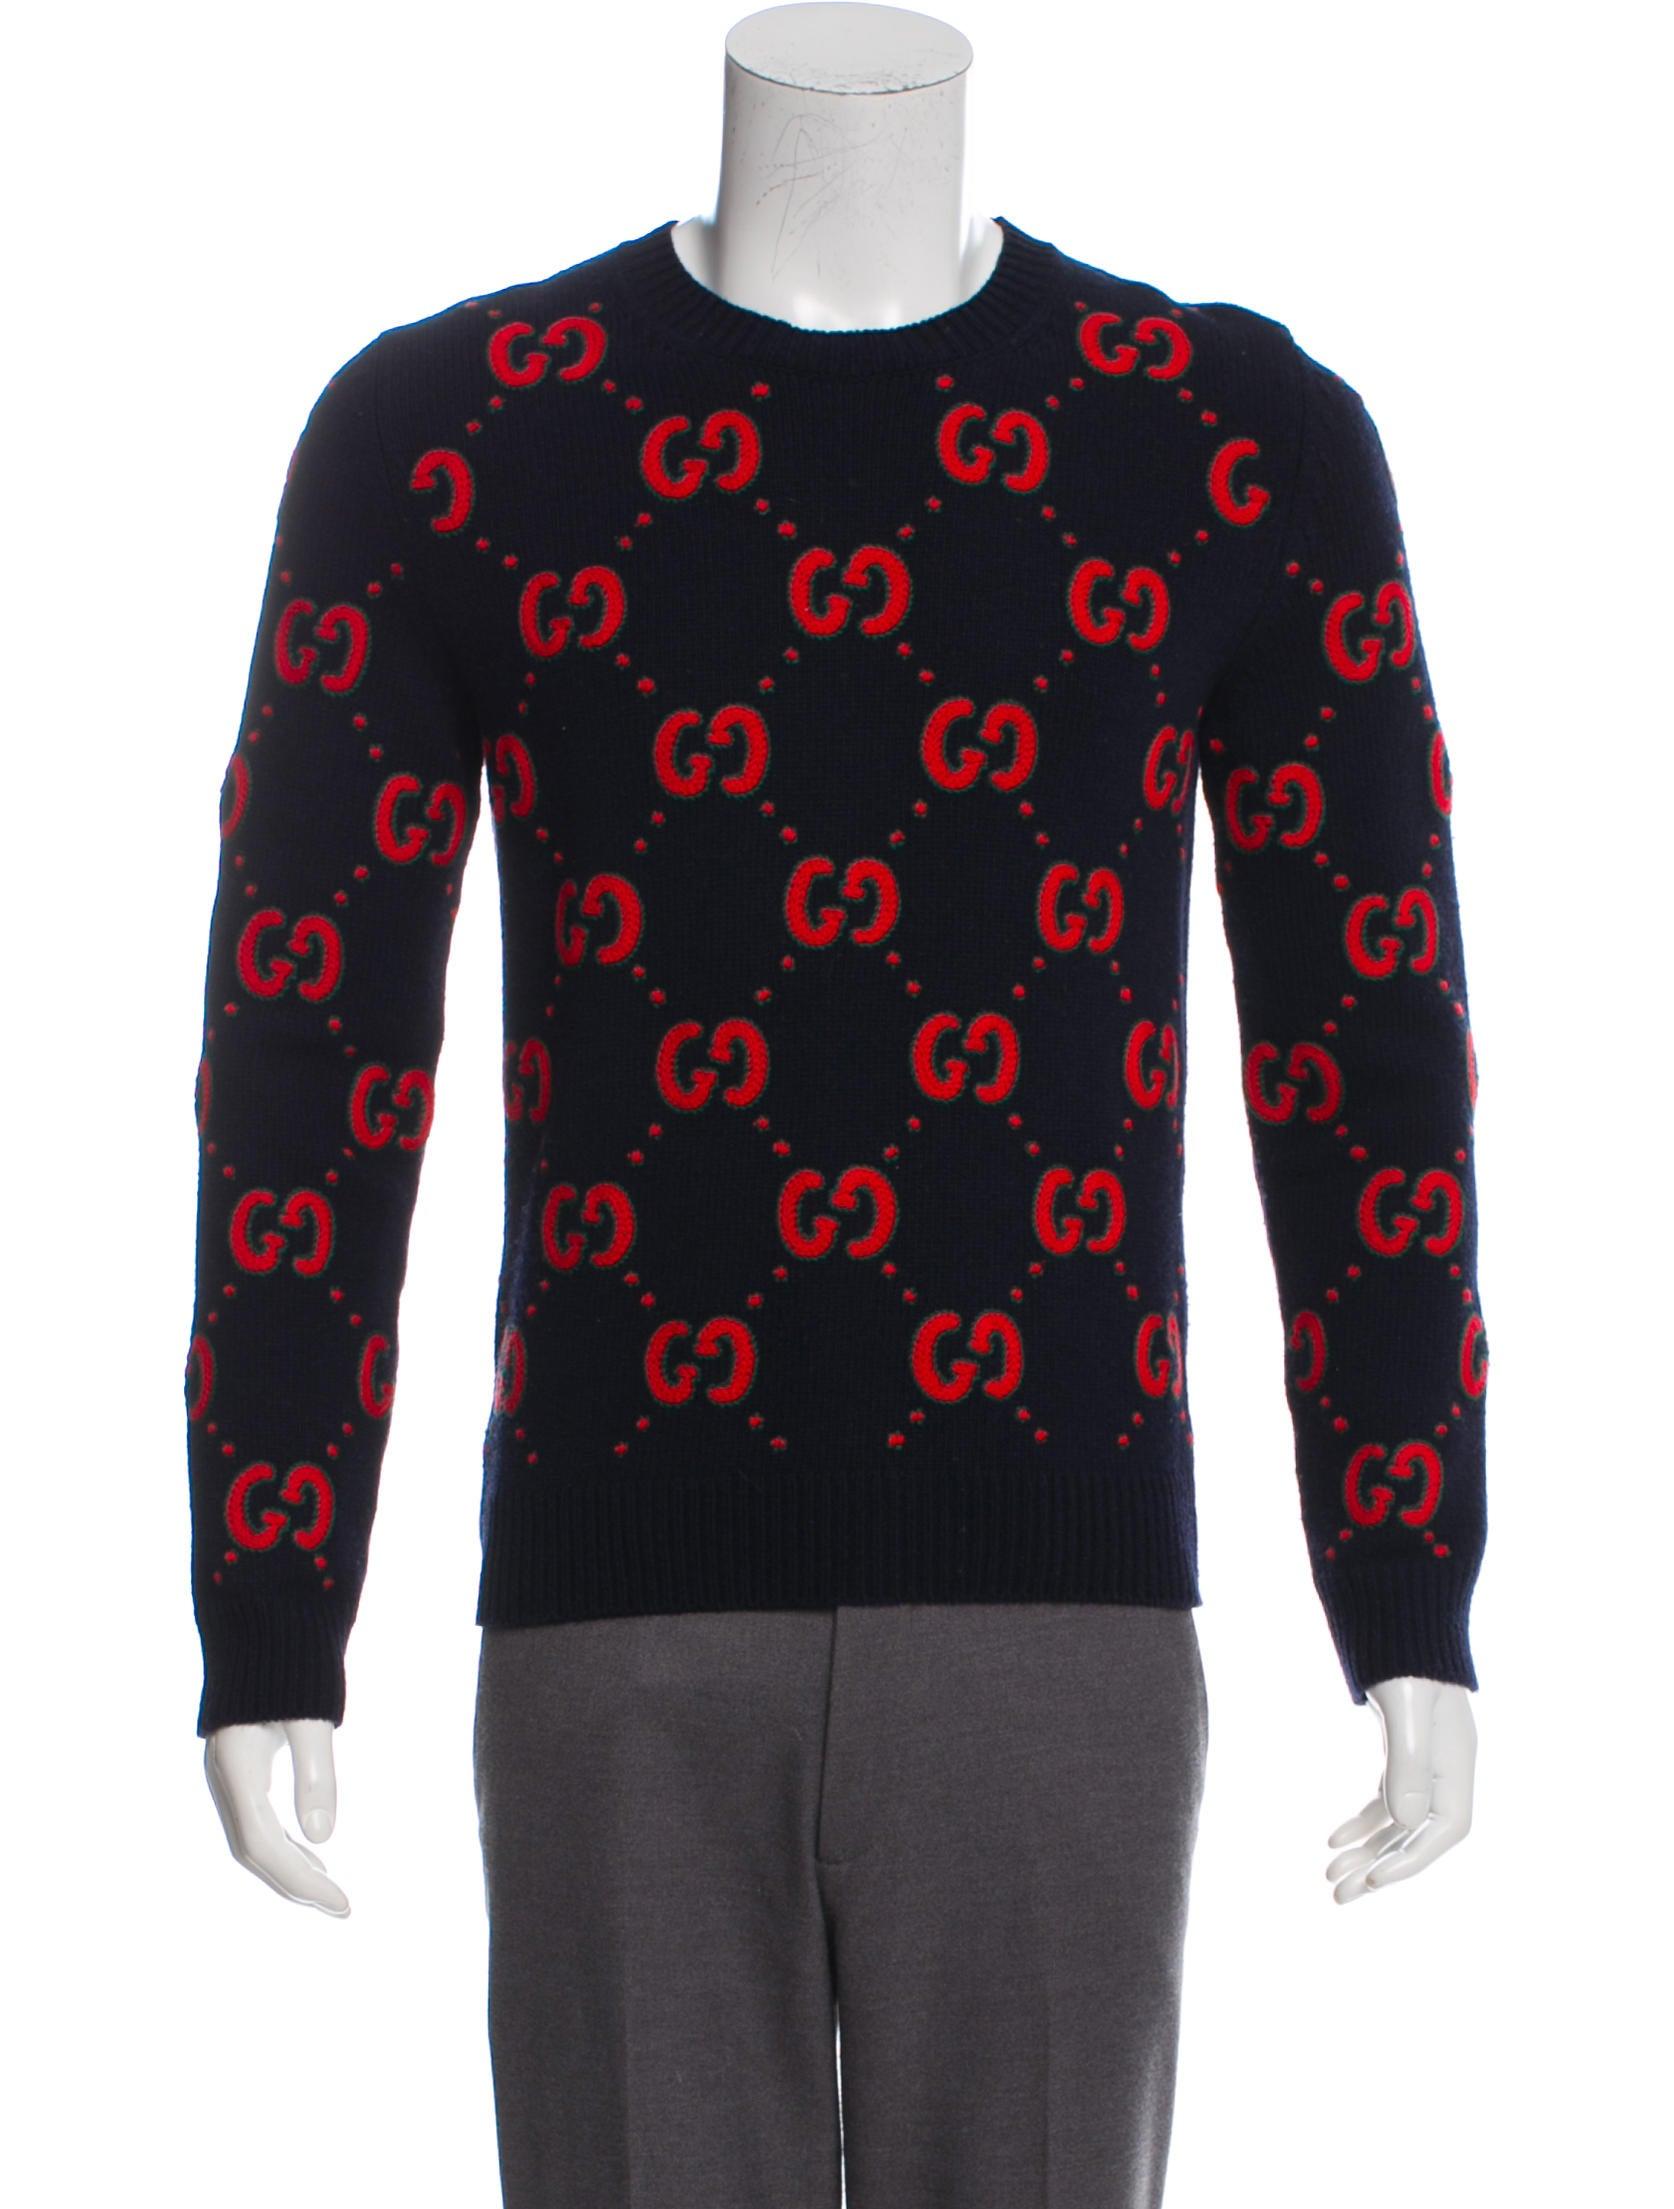 08addd36 Gucci Animalium Wool Sweater - Clothing - GUC260604 | The RealReal